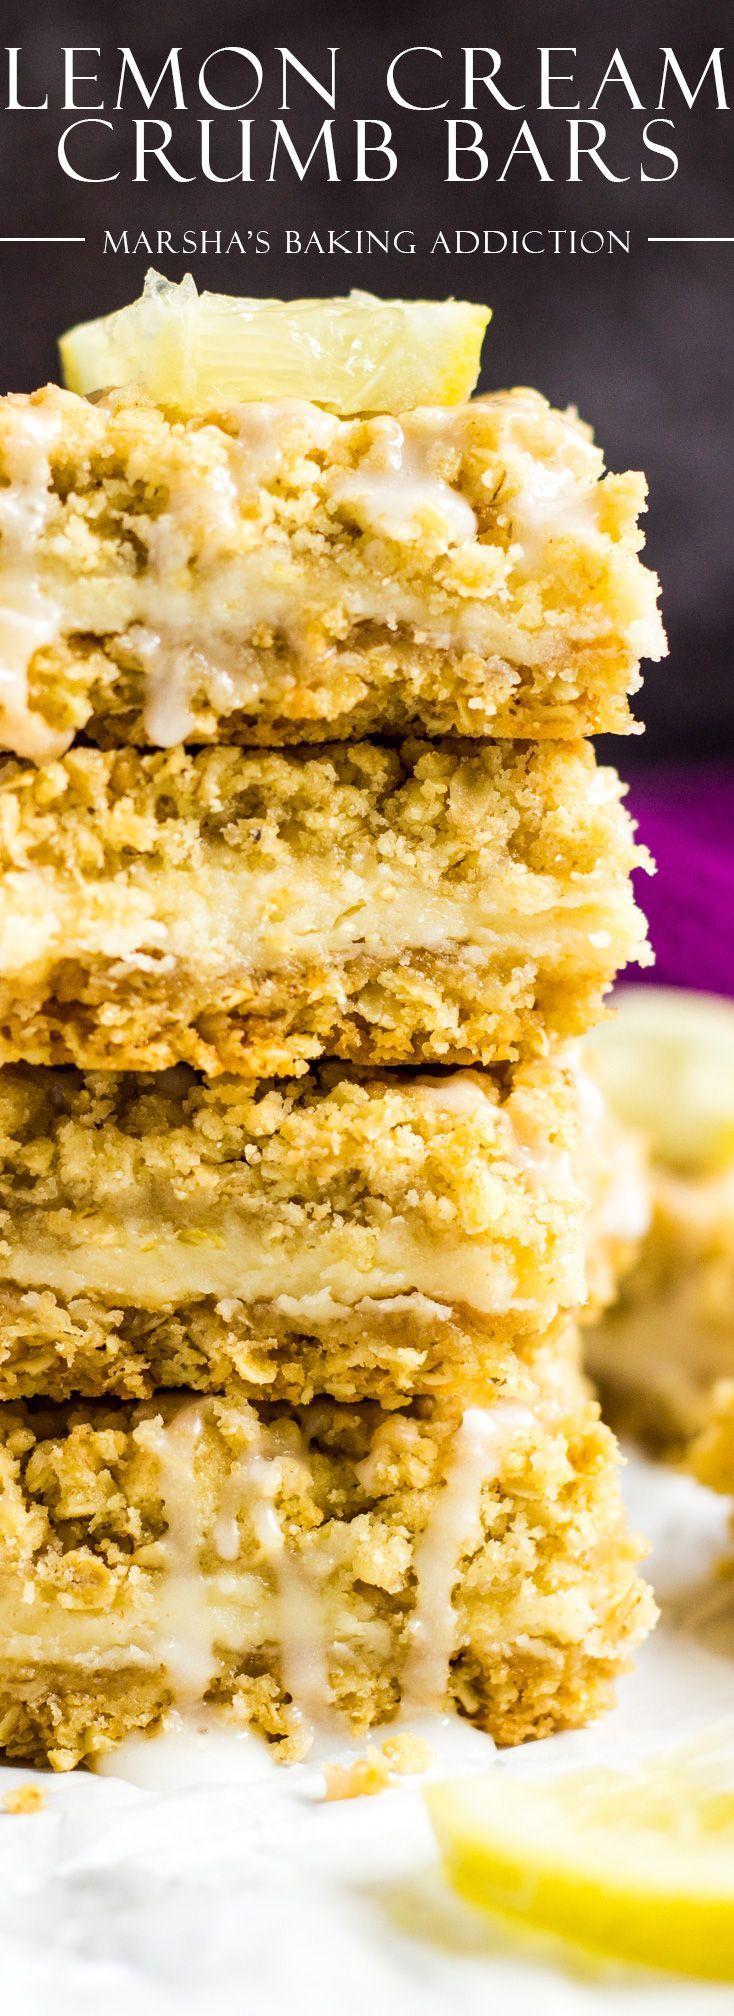 Lemon Cream Crumb Bars | marshasbakingaddiction.com @marshasbakeblog